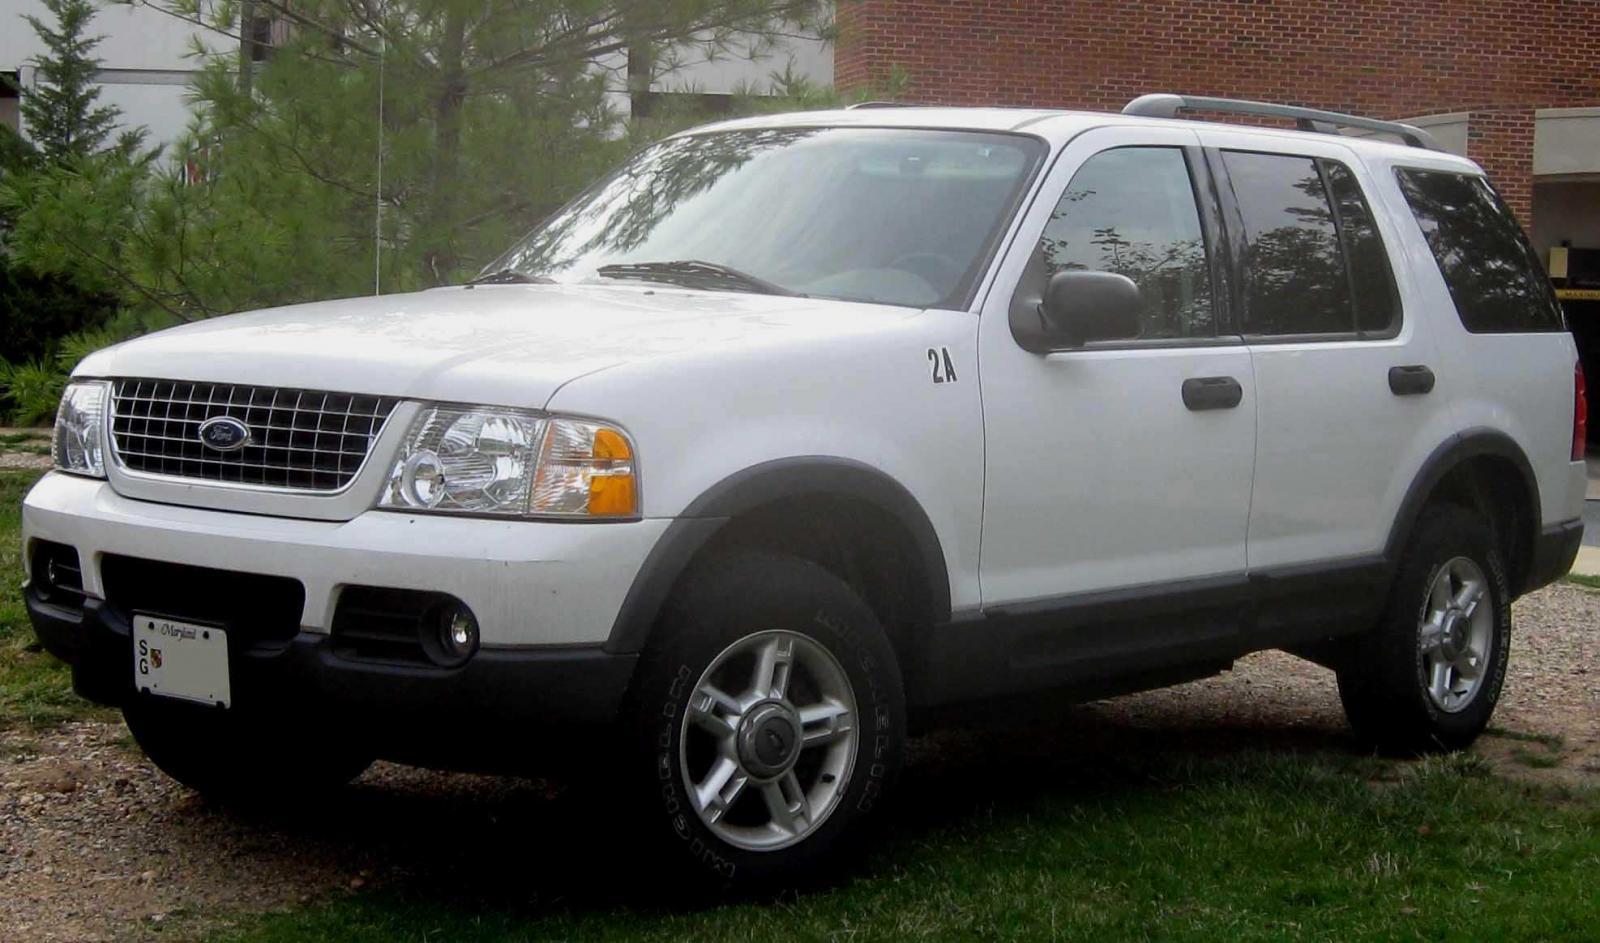 800 1024 1280 1600 origin 2002 Ford ...